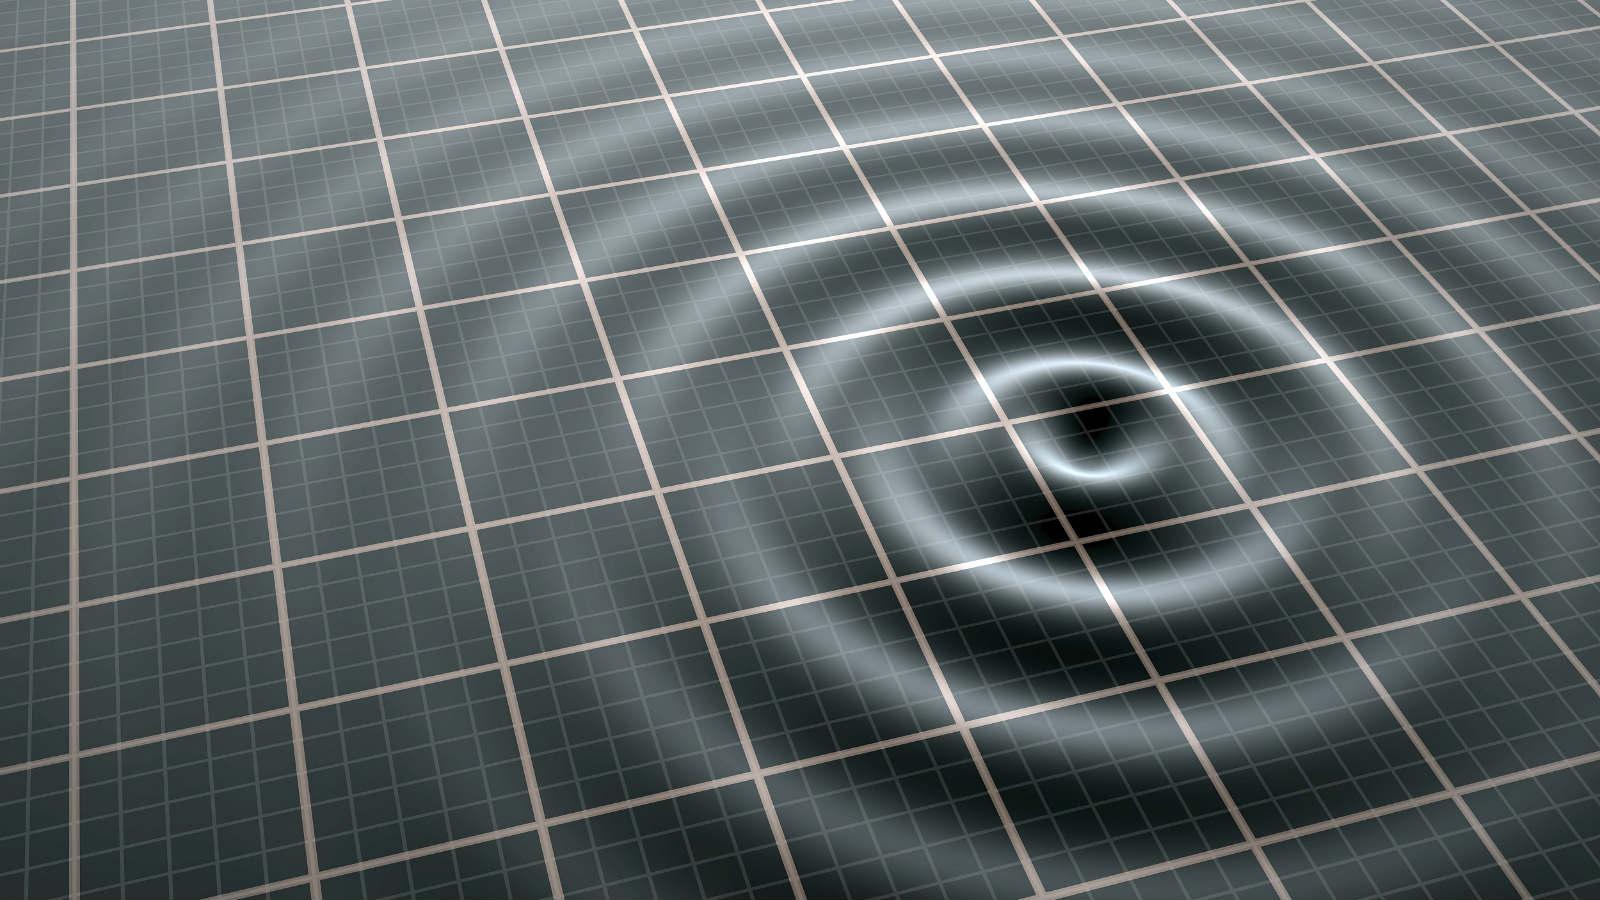 5.0-magnitude quake hits 57km S of Acari, Peru: USGS